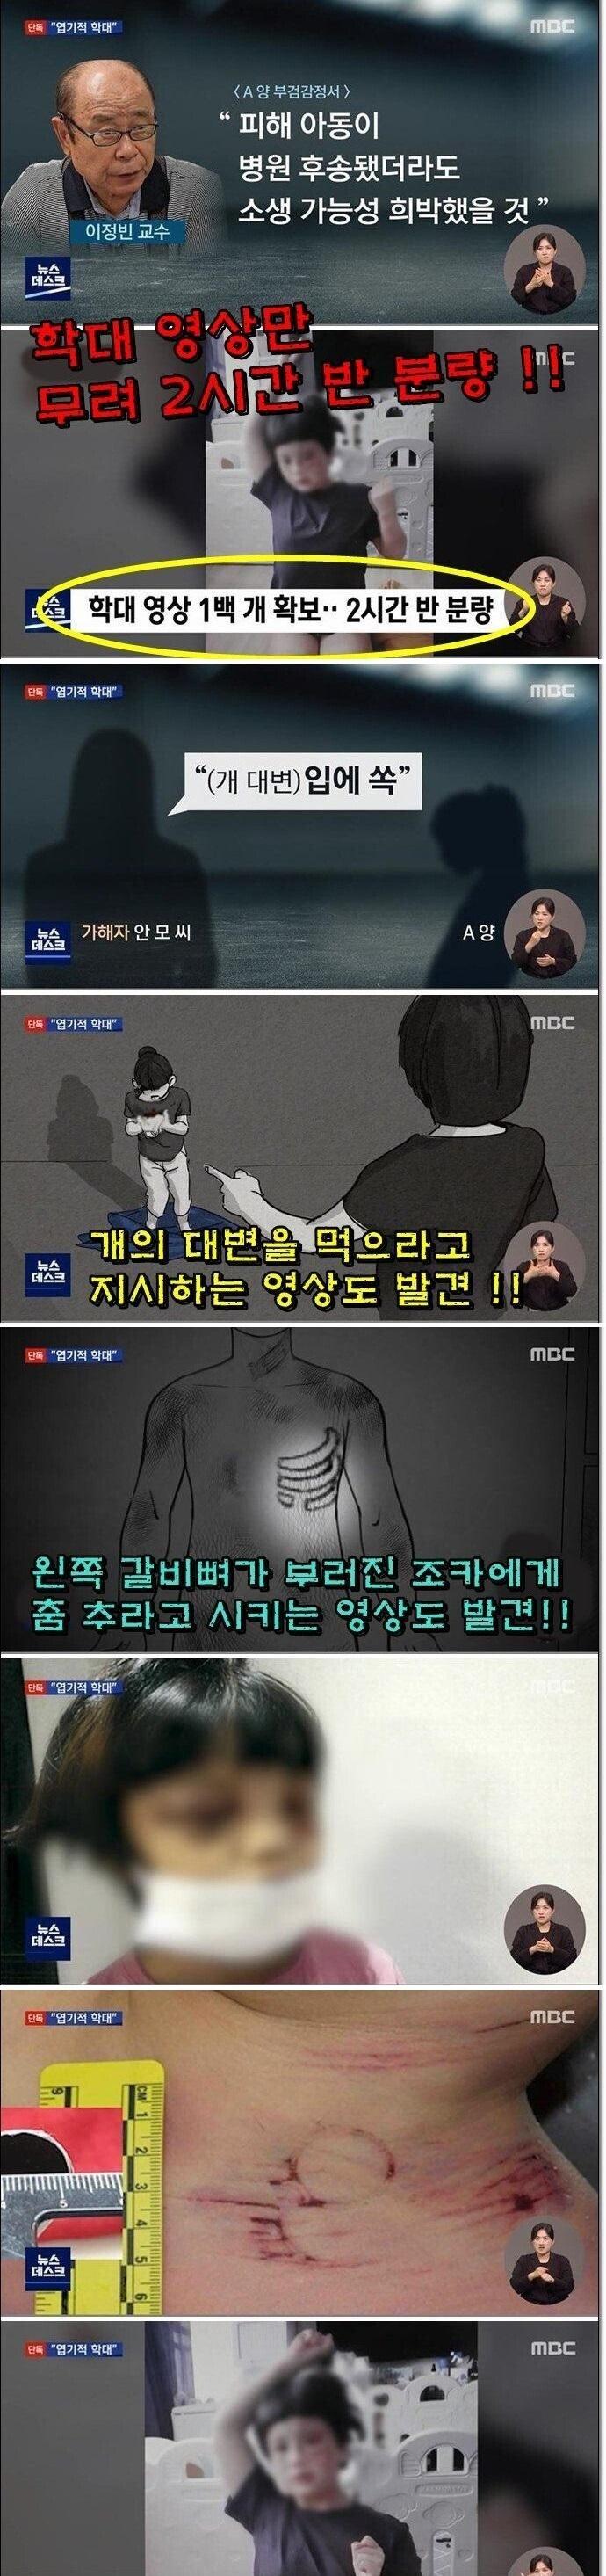 3.jpg 극혐) 난리난 이모부부 사건.JPG